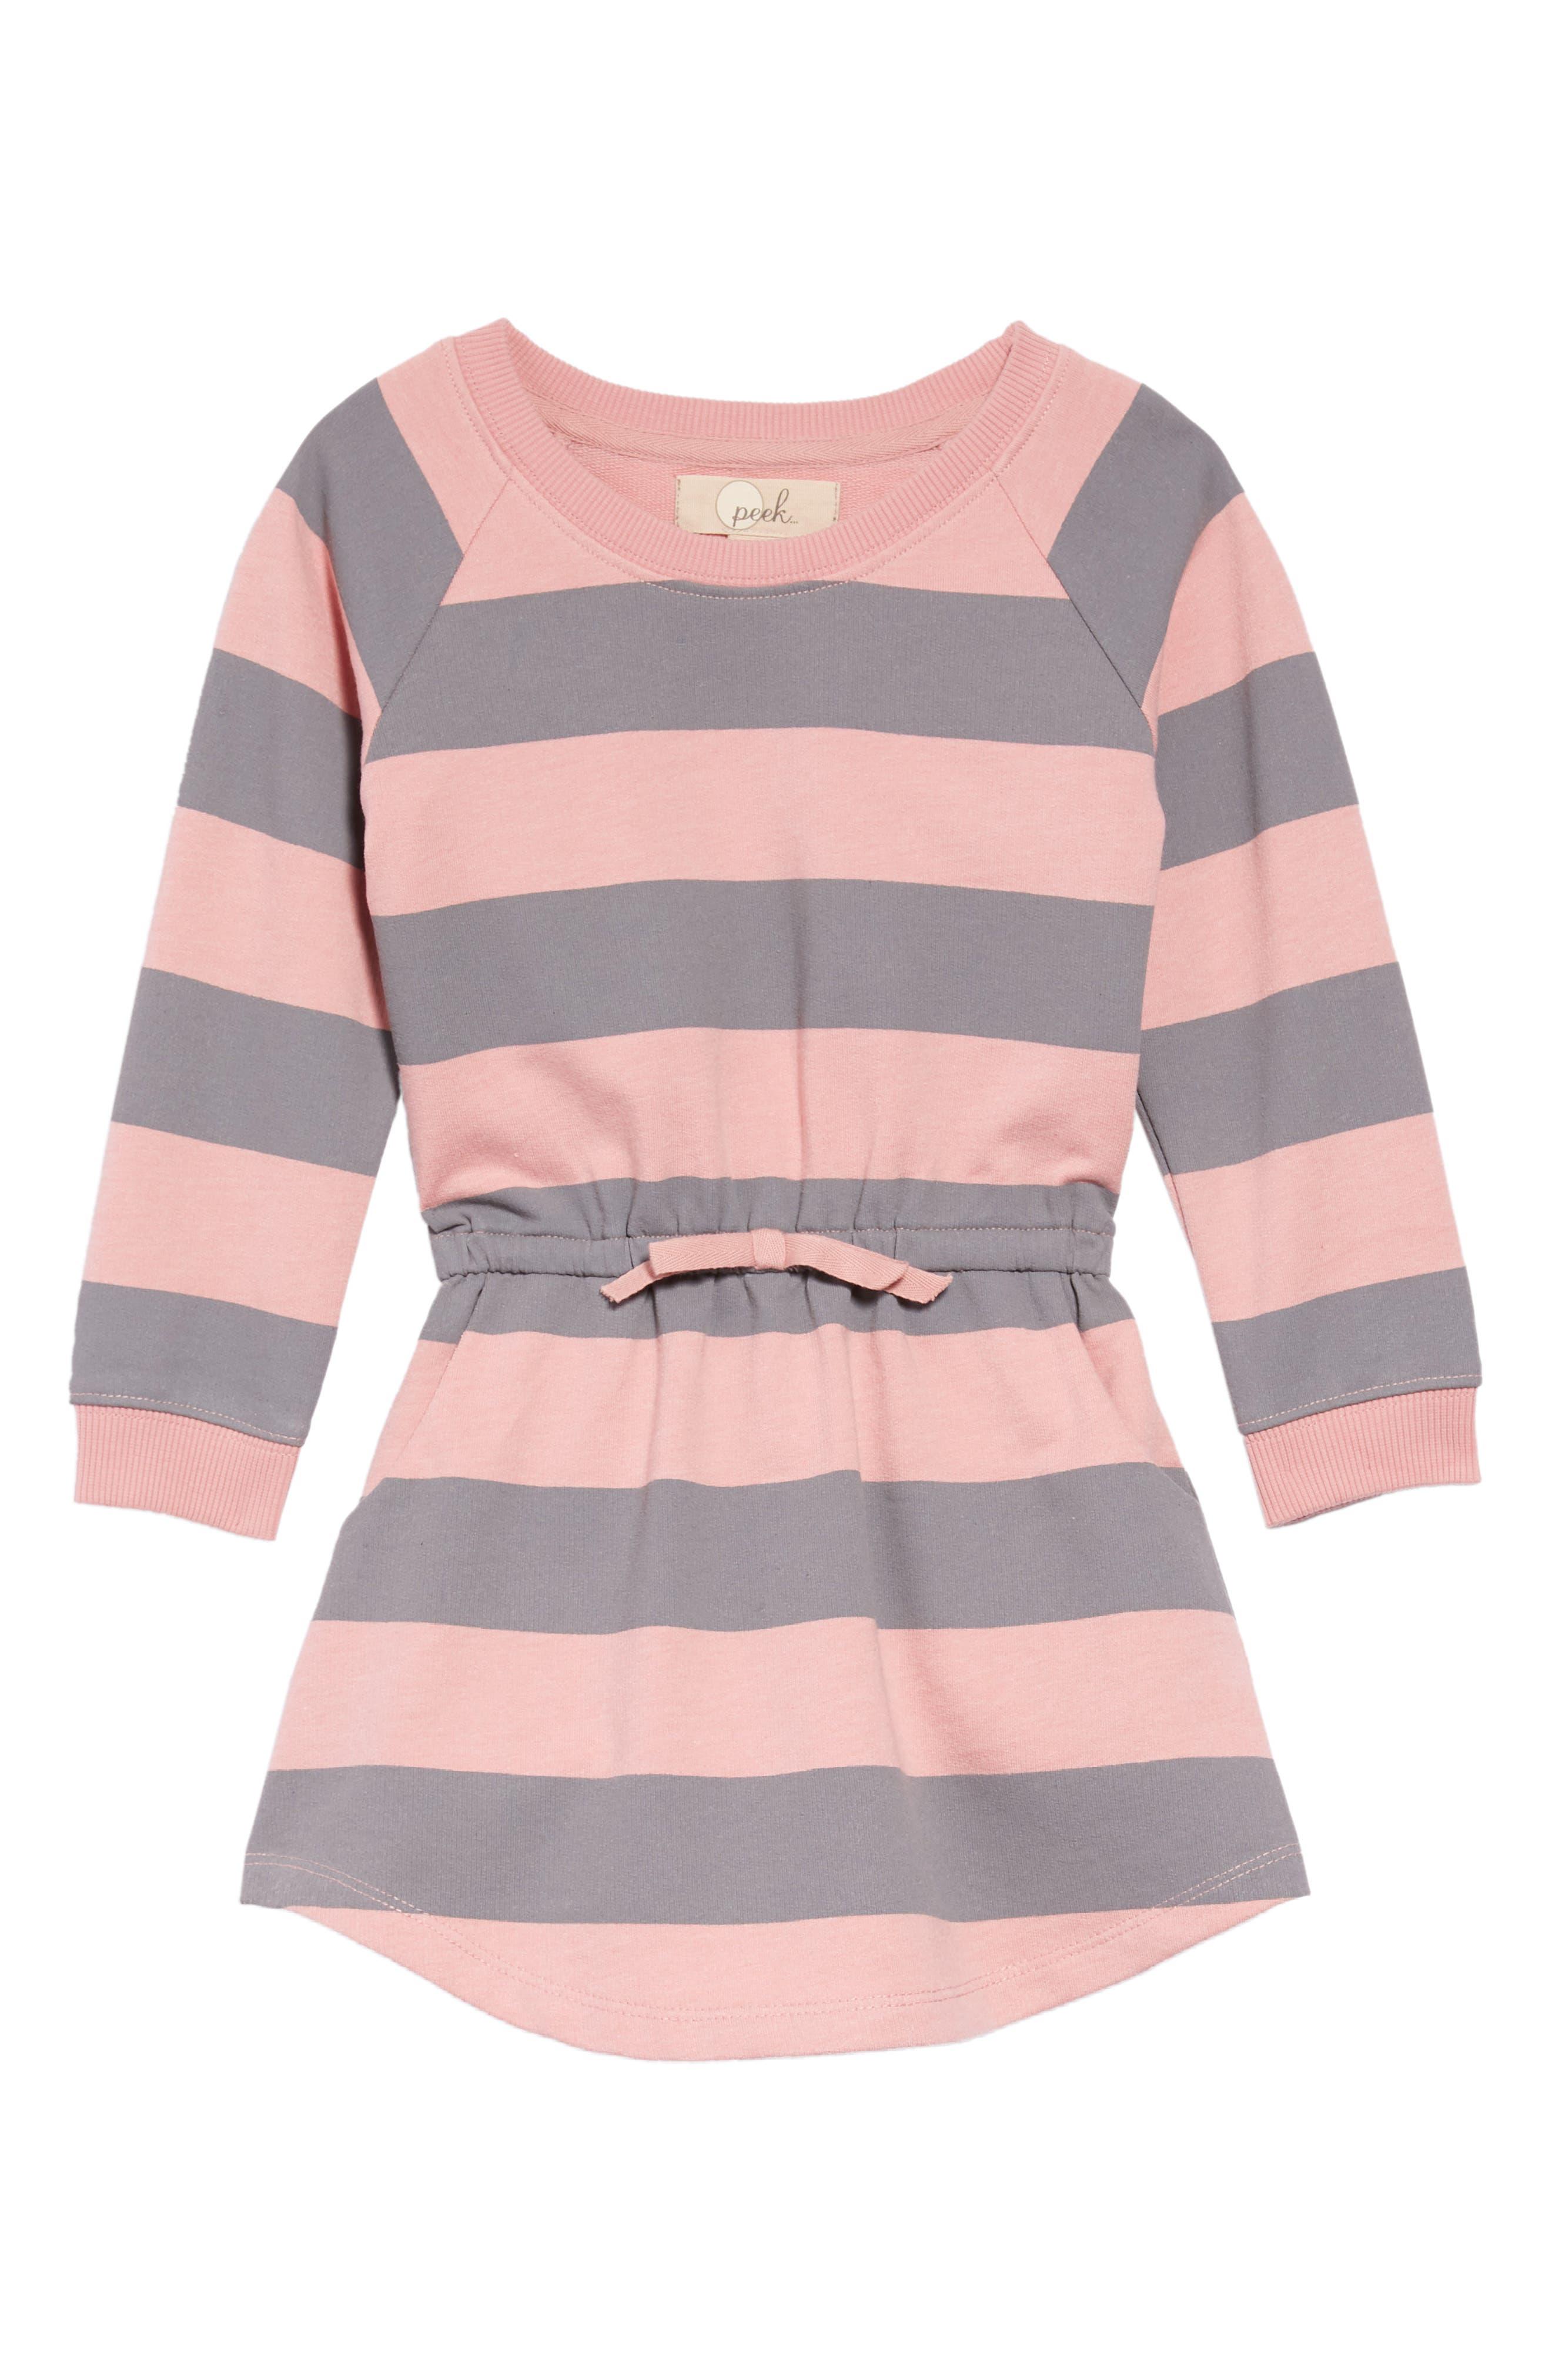 Peek Ruby Sweatshirt Dress,                             Main thumbnail 1, color,                             650